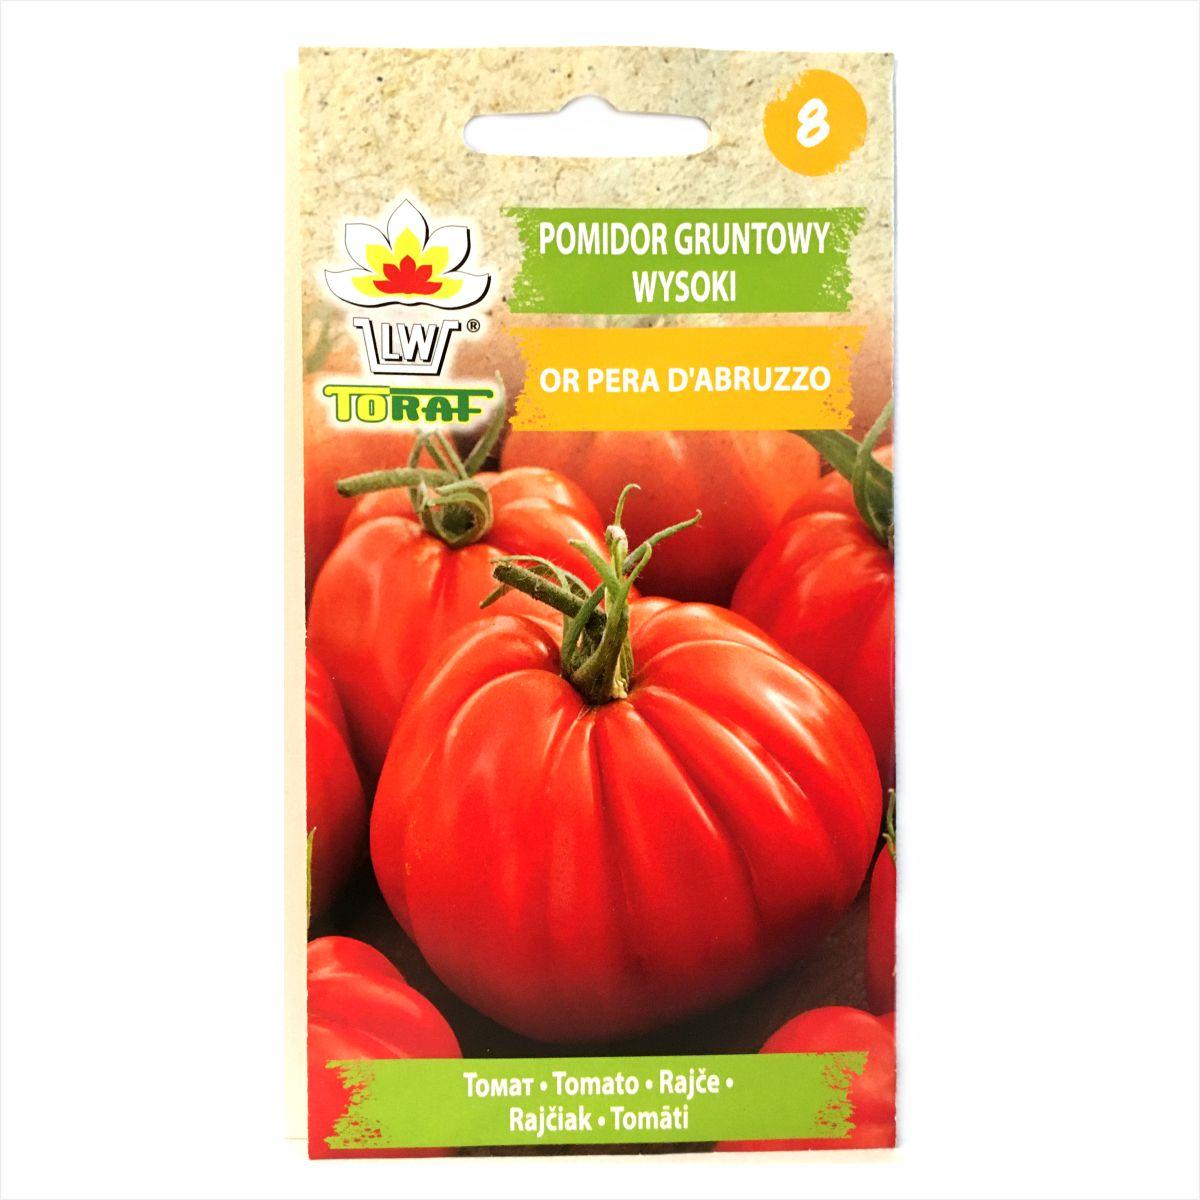 Pomidor Or Pera D'Abruzzo nasiona Toraf